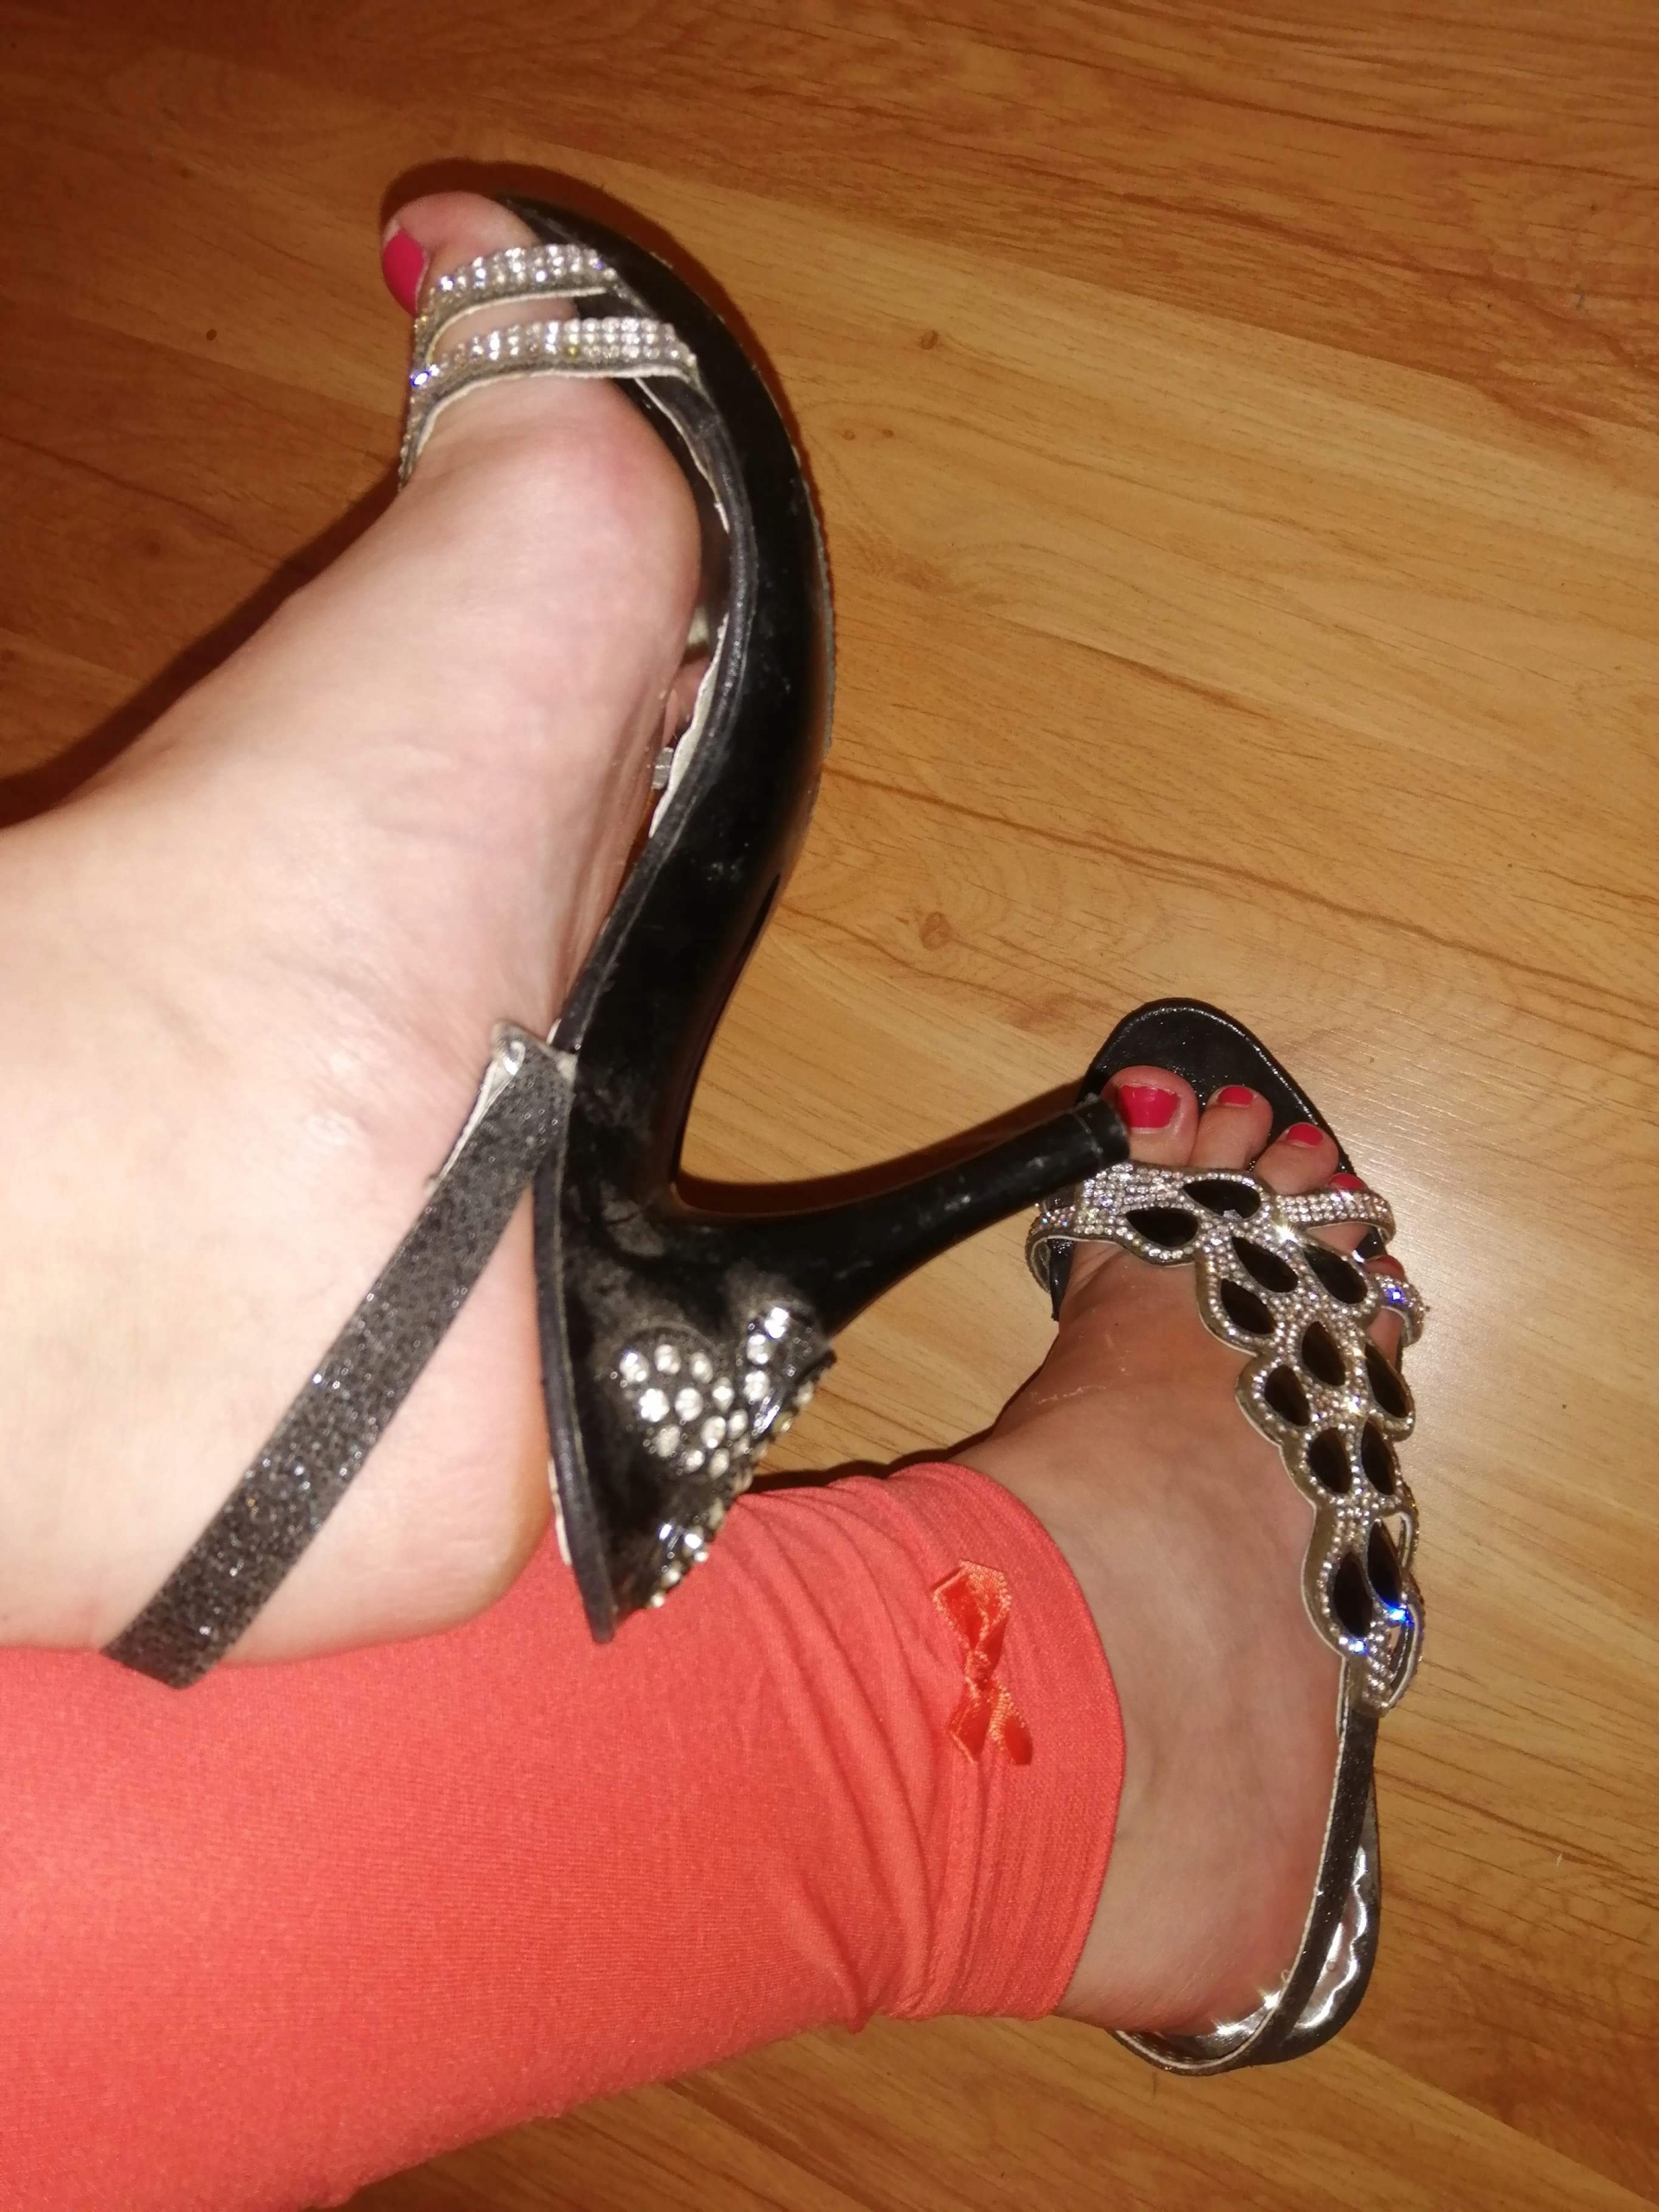 Item Black shoes sandals rhinestones 36 used Fetish